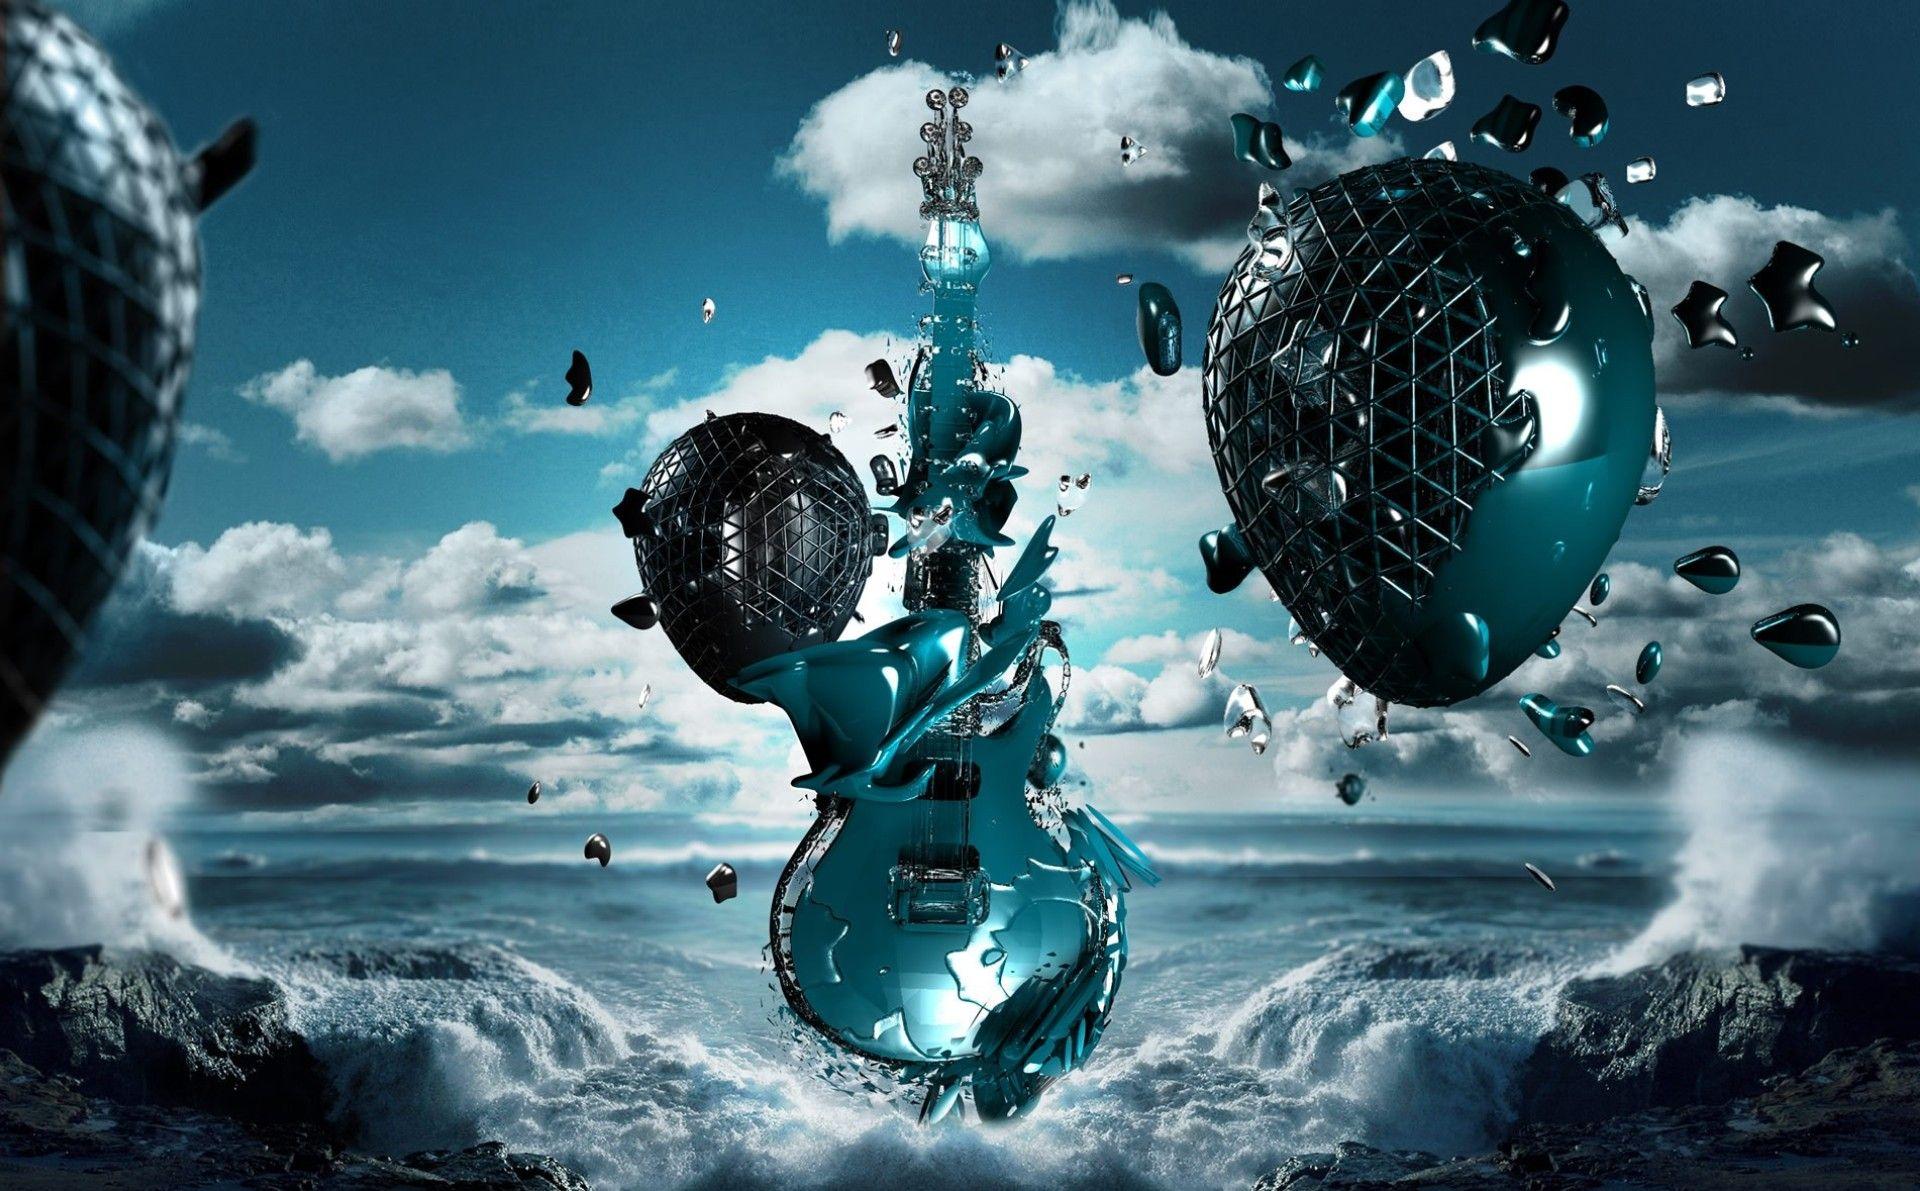 3d Music 3d Music Wallpaper 3d Music Wallpaper Wallpaper 1280x1024 Fotos